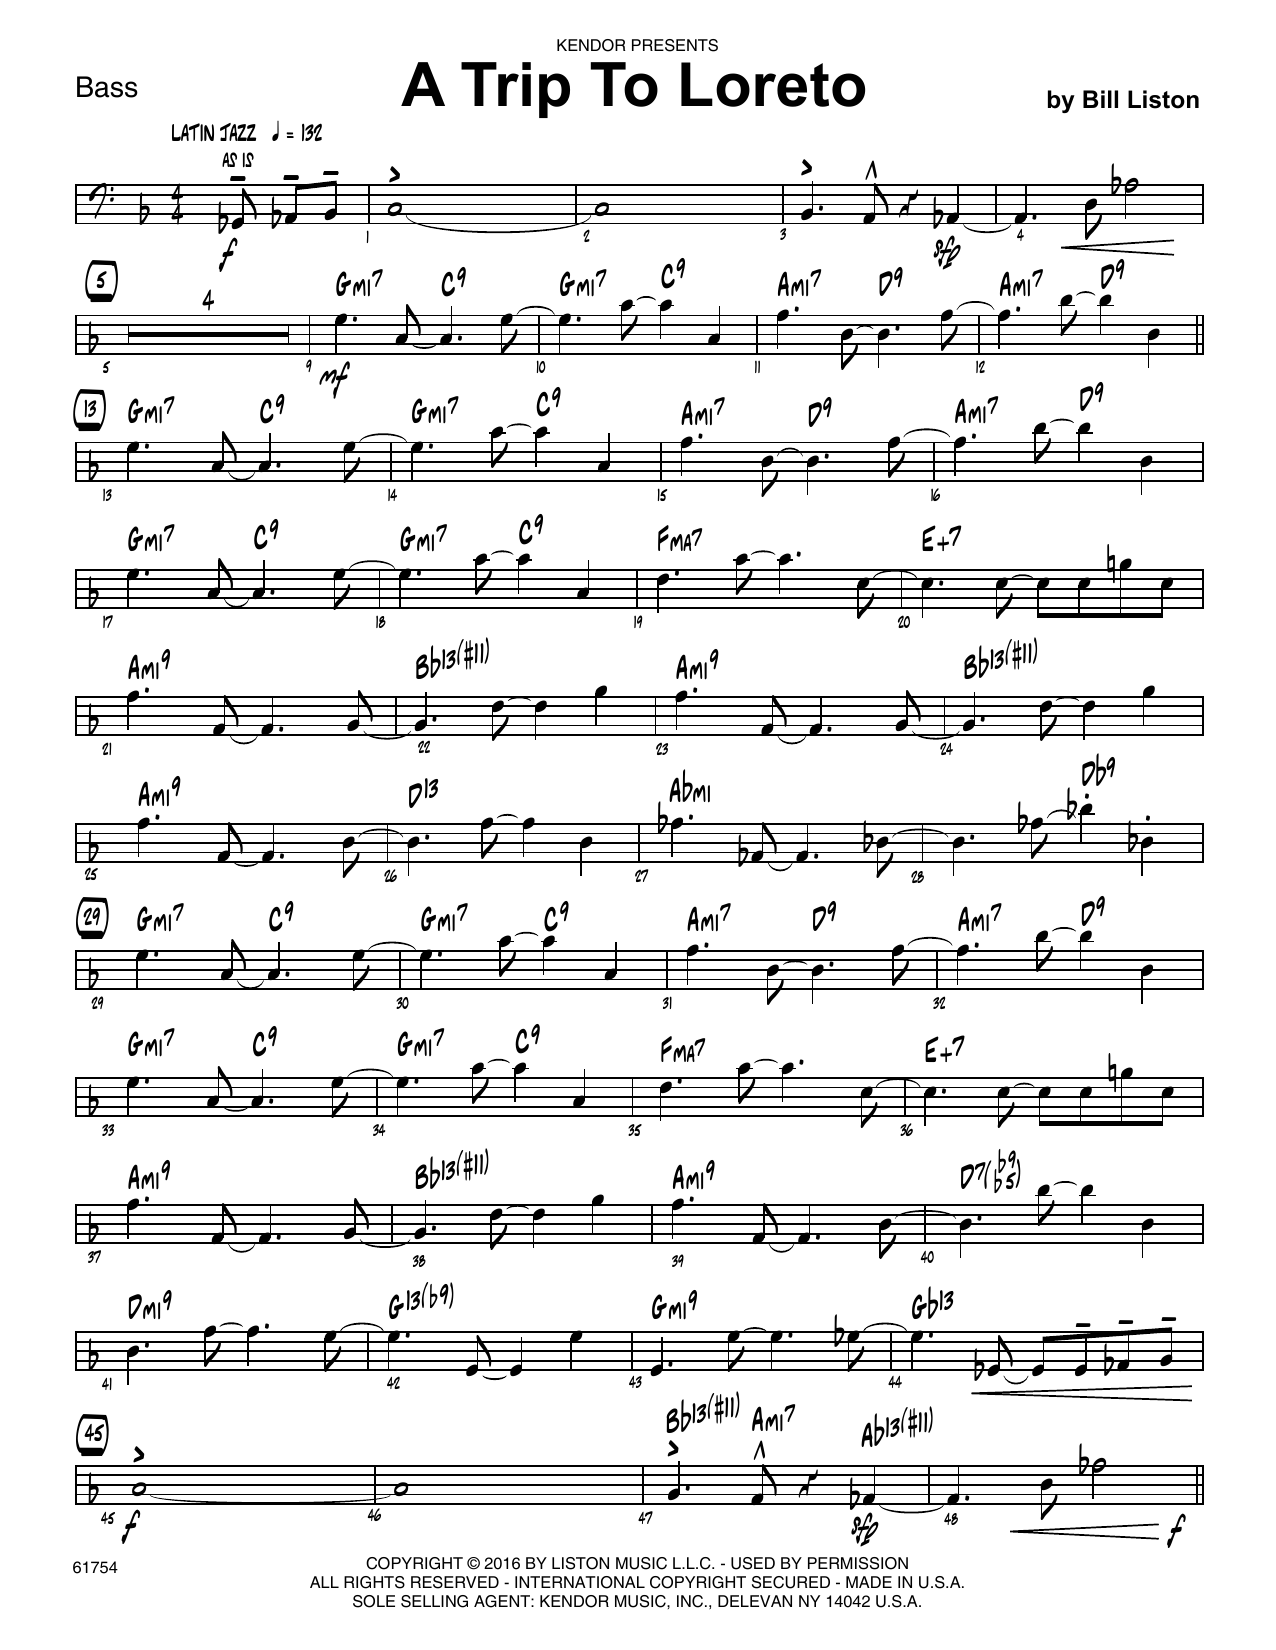 A Trip To Loreto - Bass Sheet Music